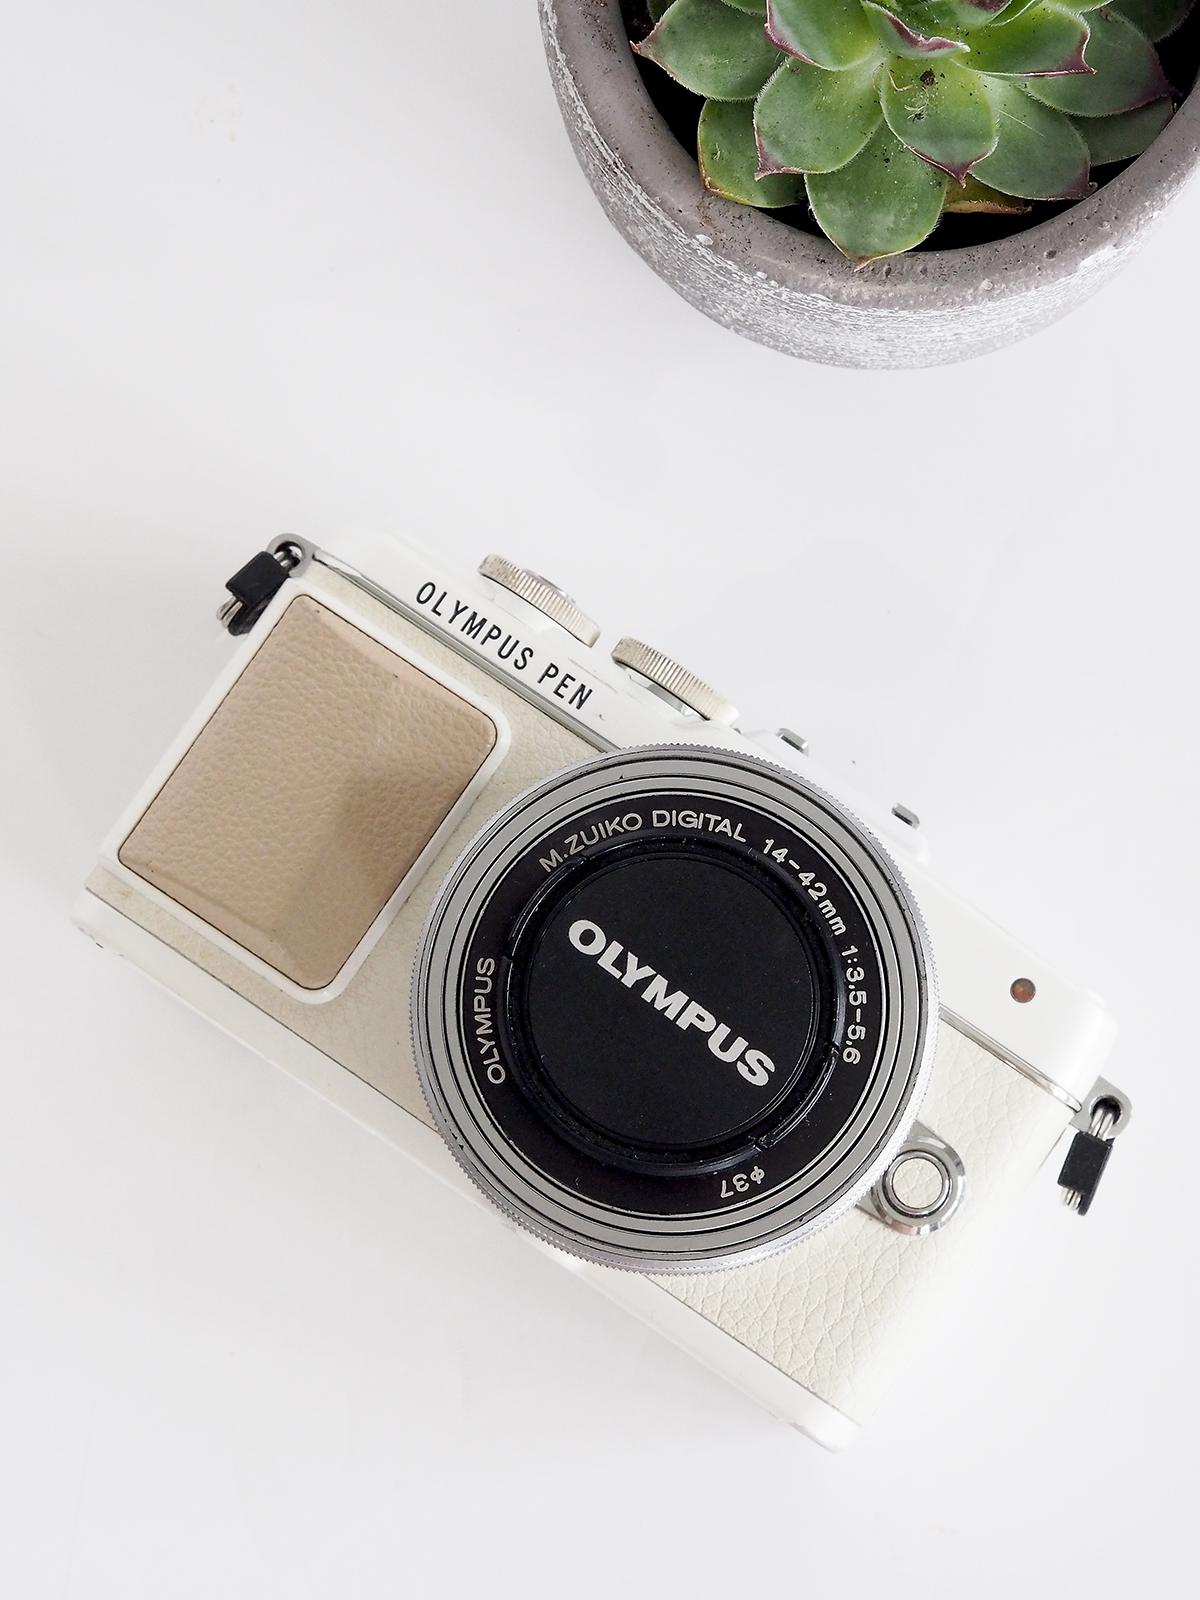 Olympus Pen EPL7 vs EPL8 camera comparison